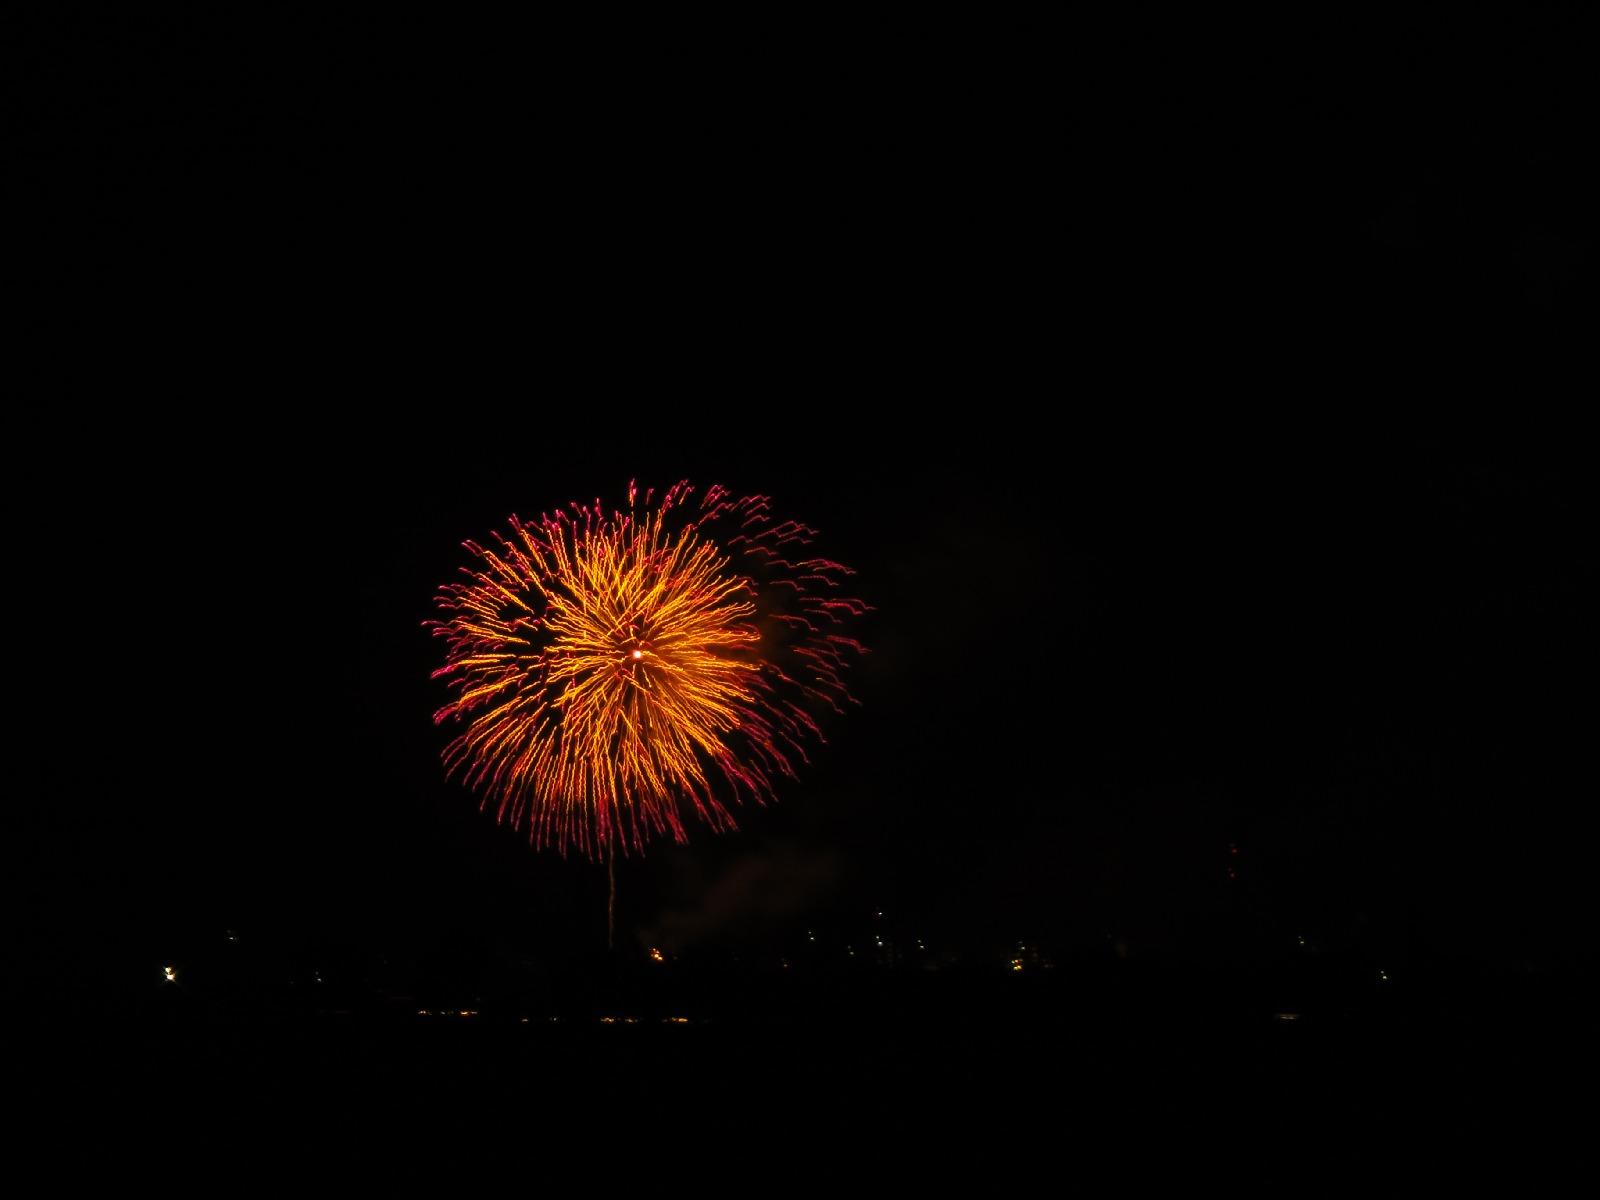 120728kasaokafireflower_031.jpg